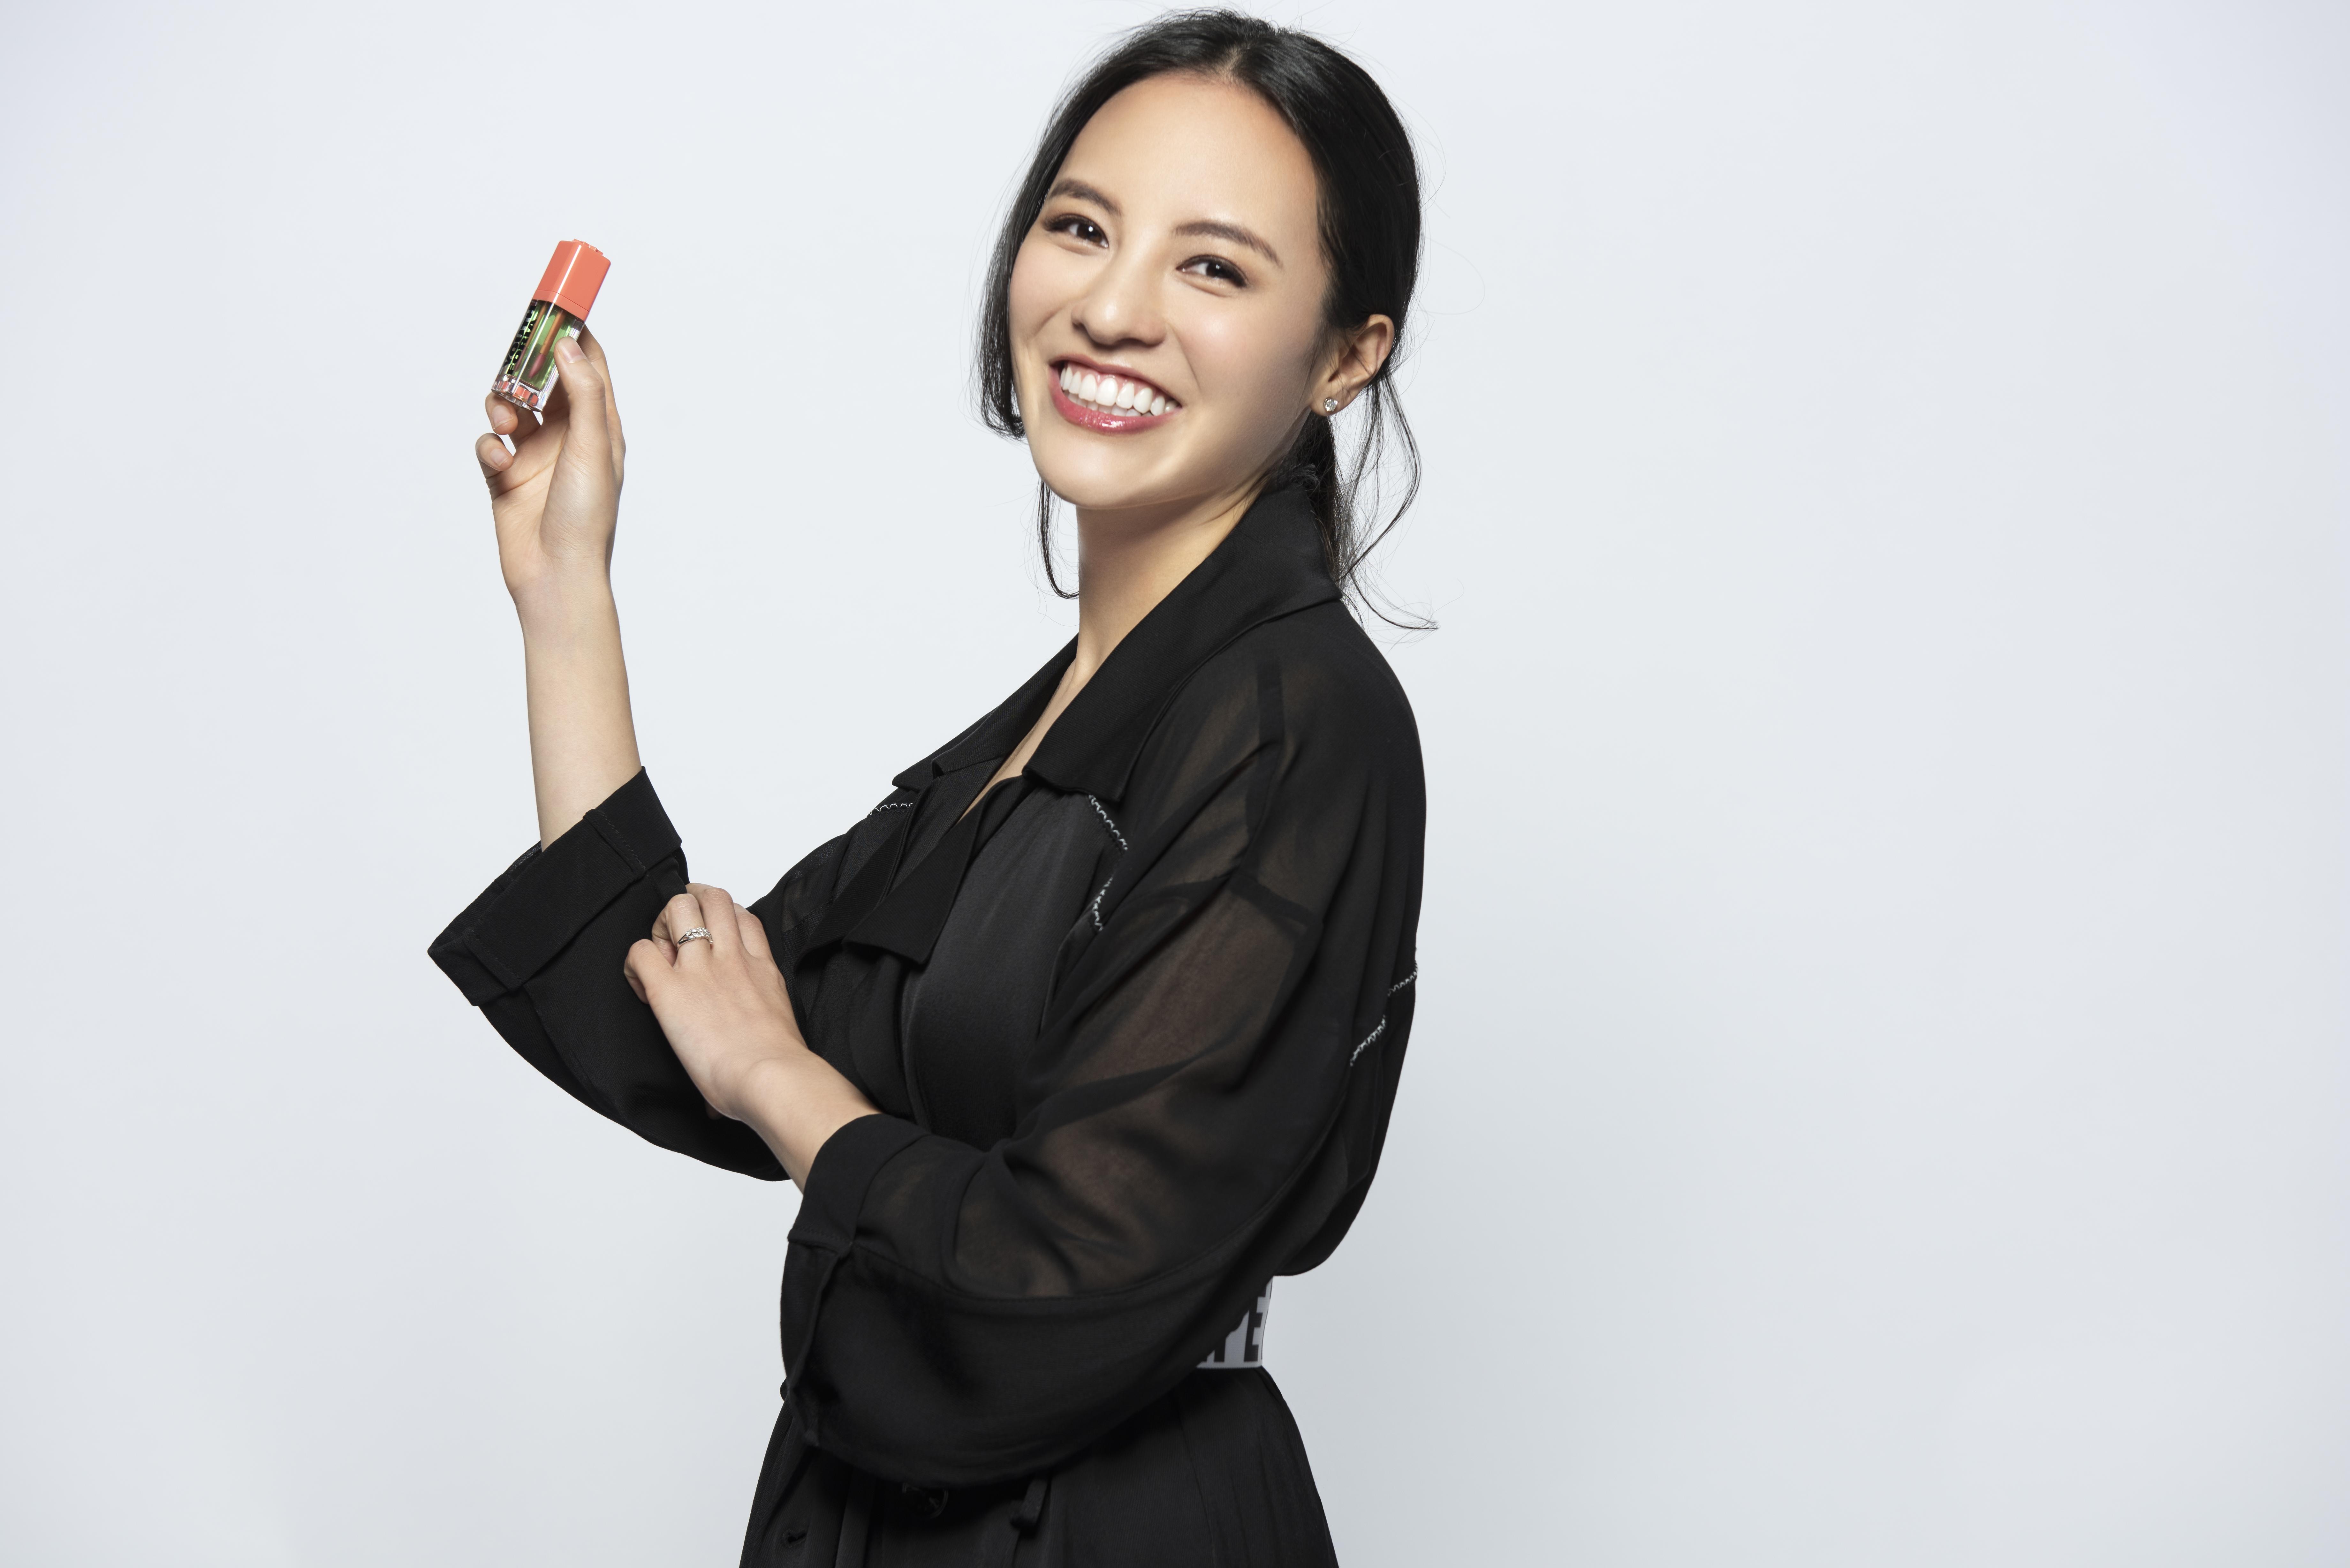 Youthforia founder Fiona Co Chan